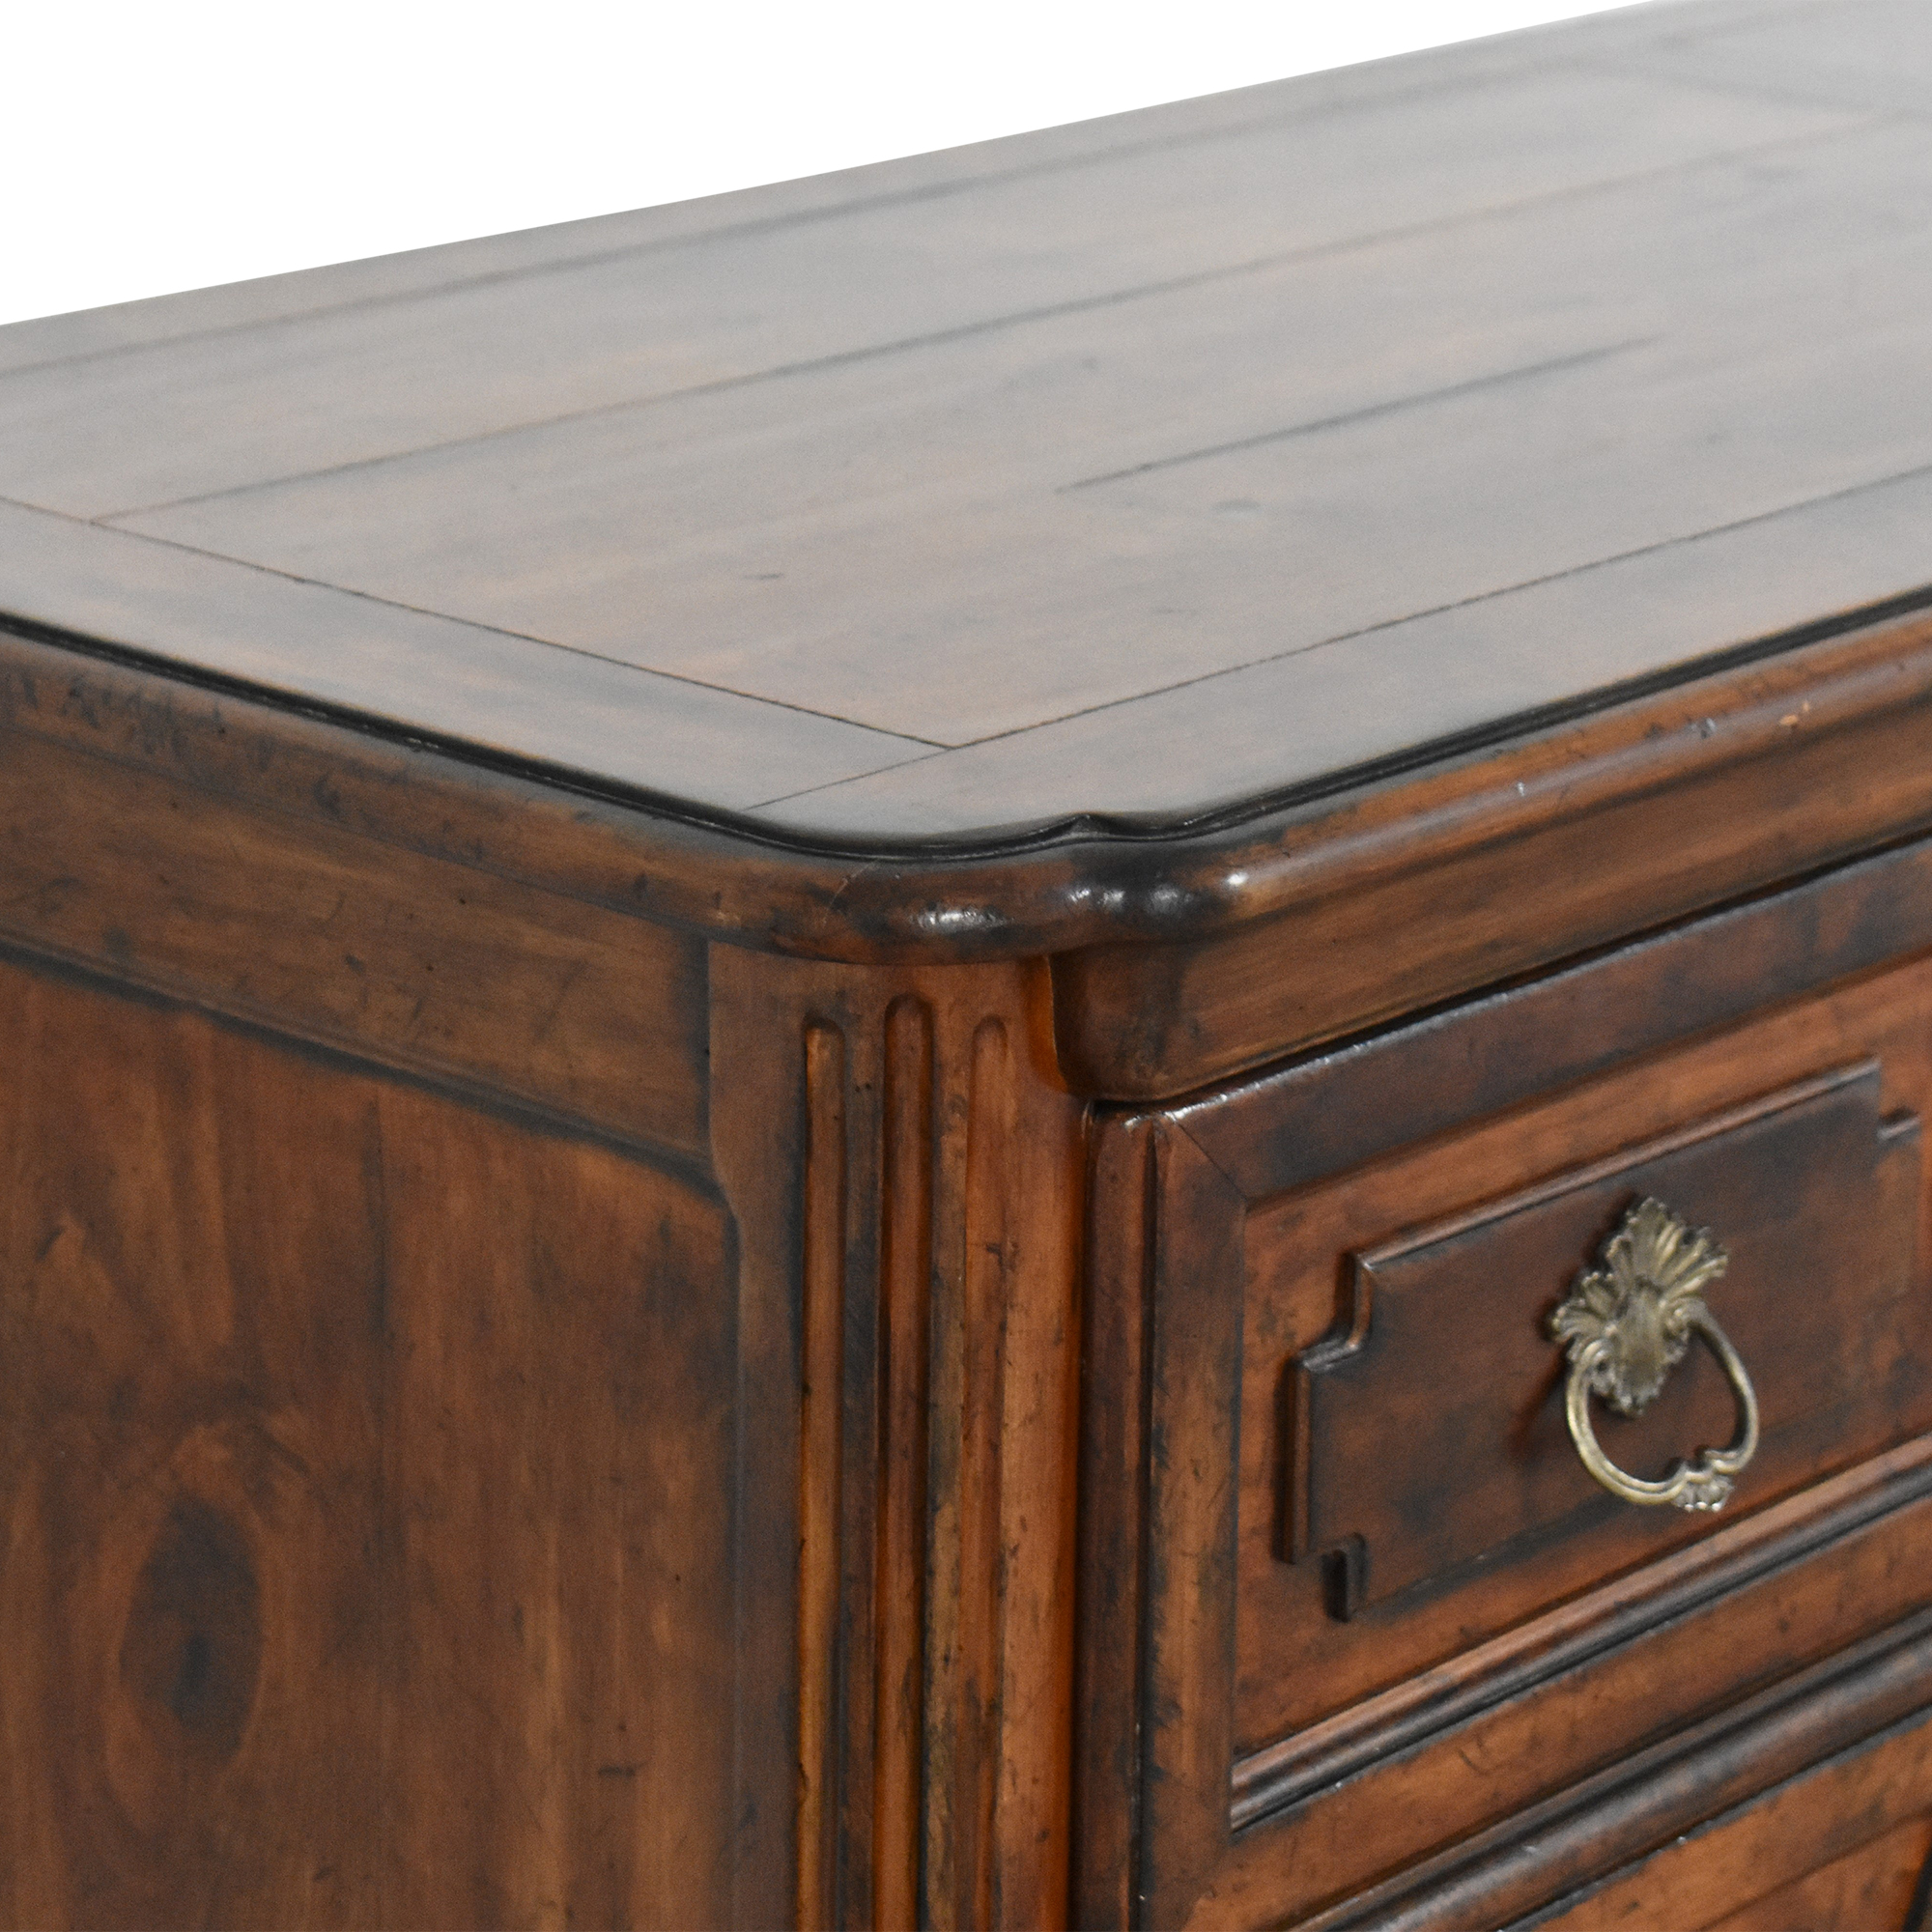 Henredon Furniture Henredon Six Drawer Double Dresser dimensions